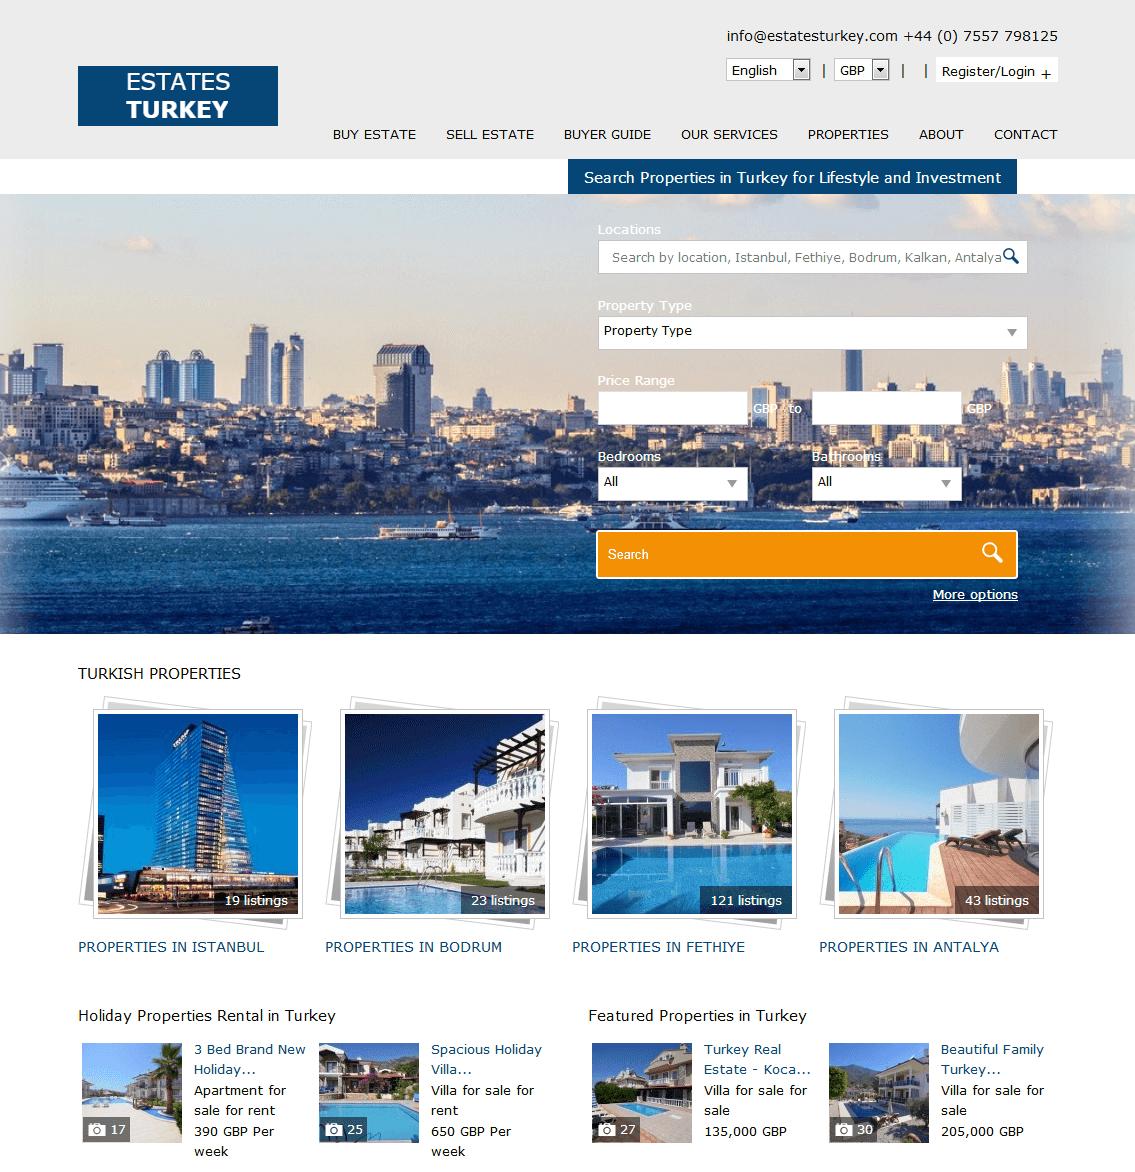 estatesturkey.com